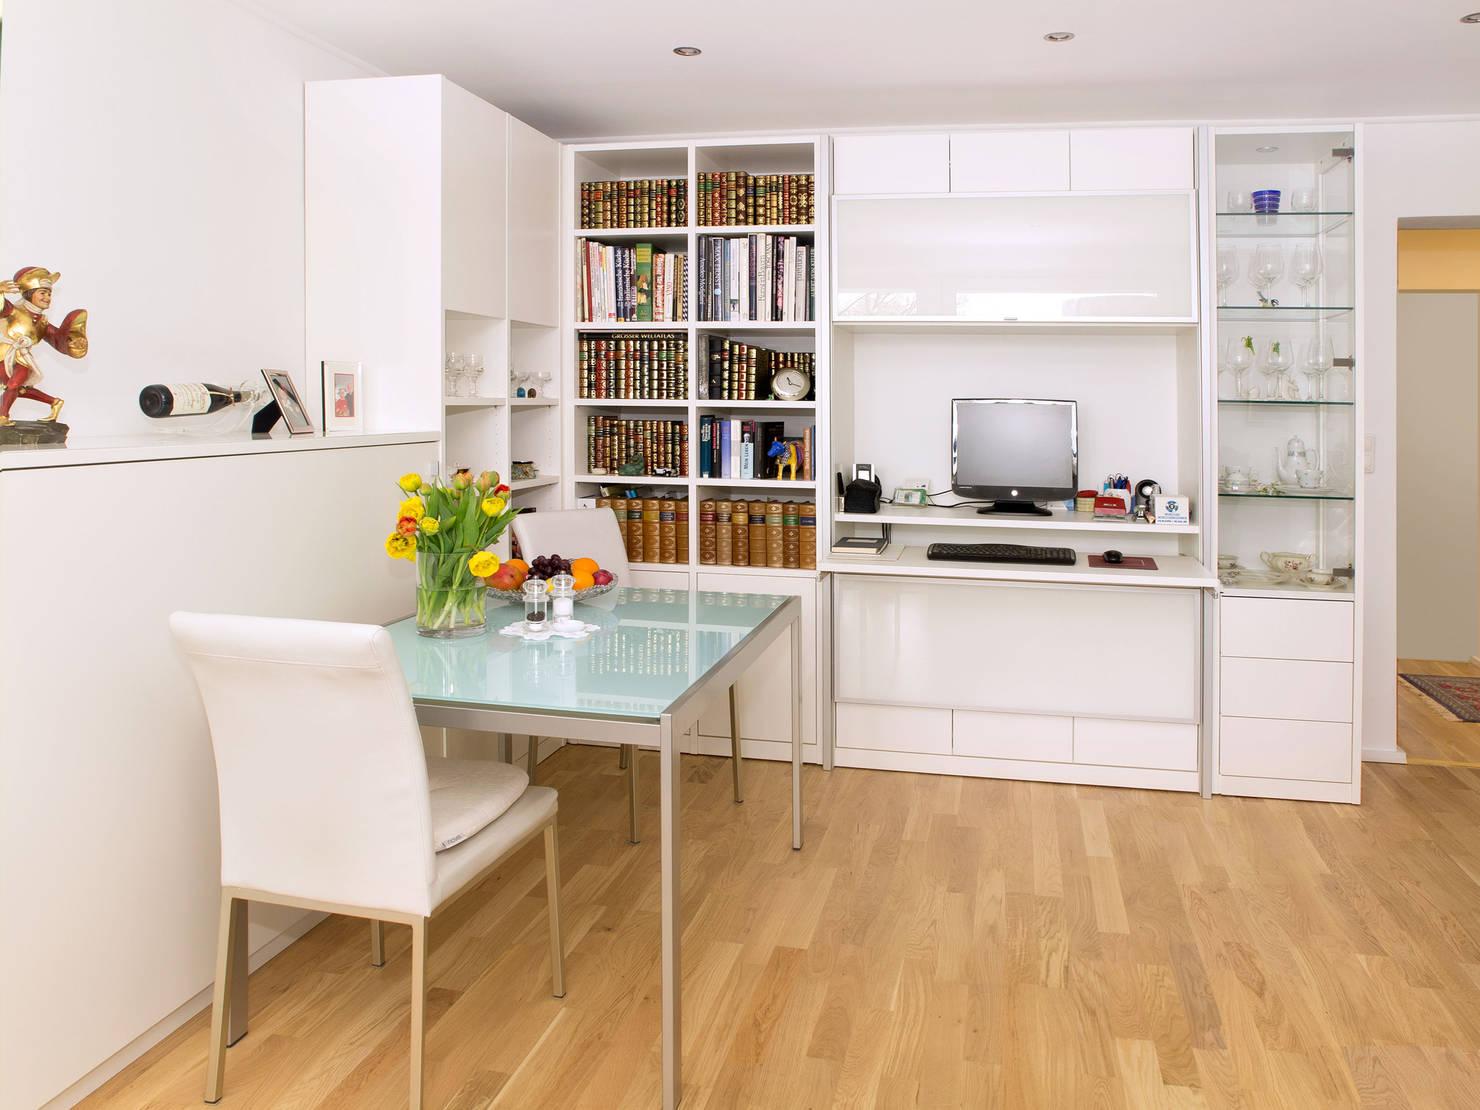 6 fantastic home-office ideas!